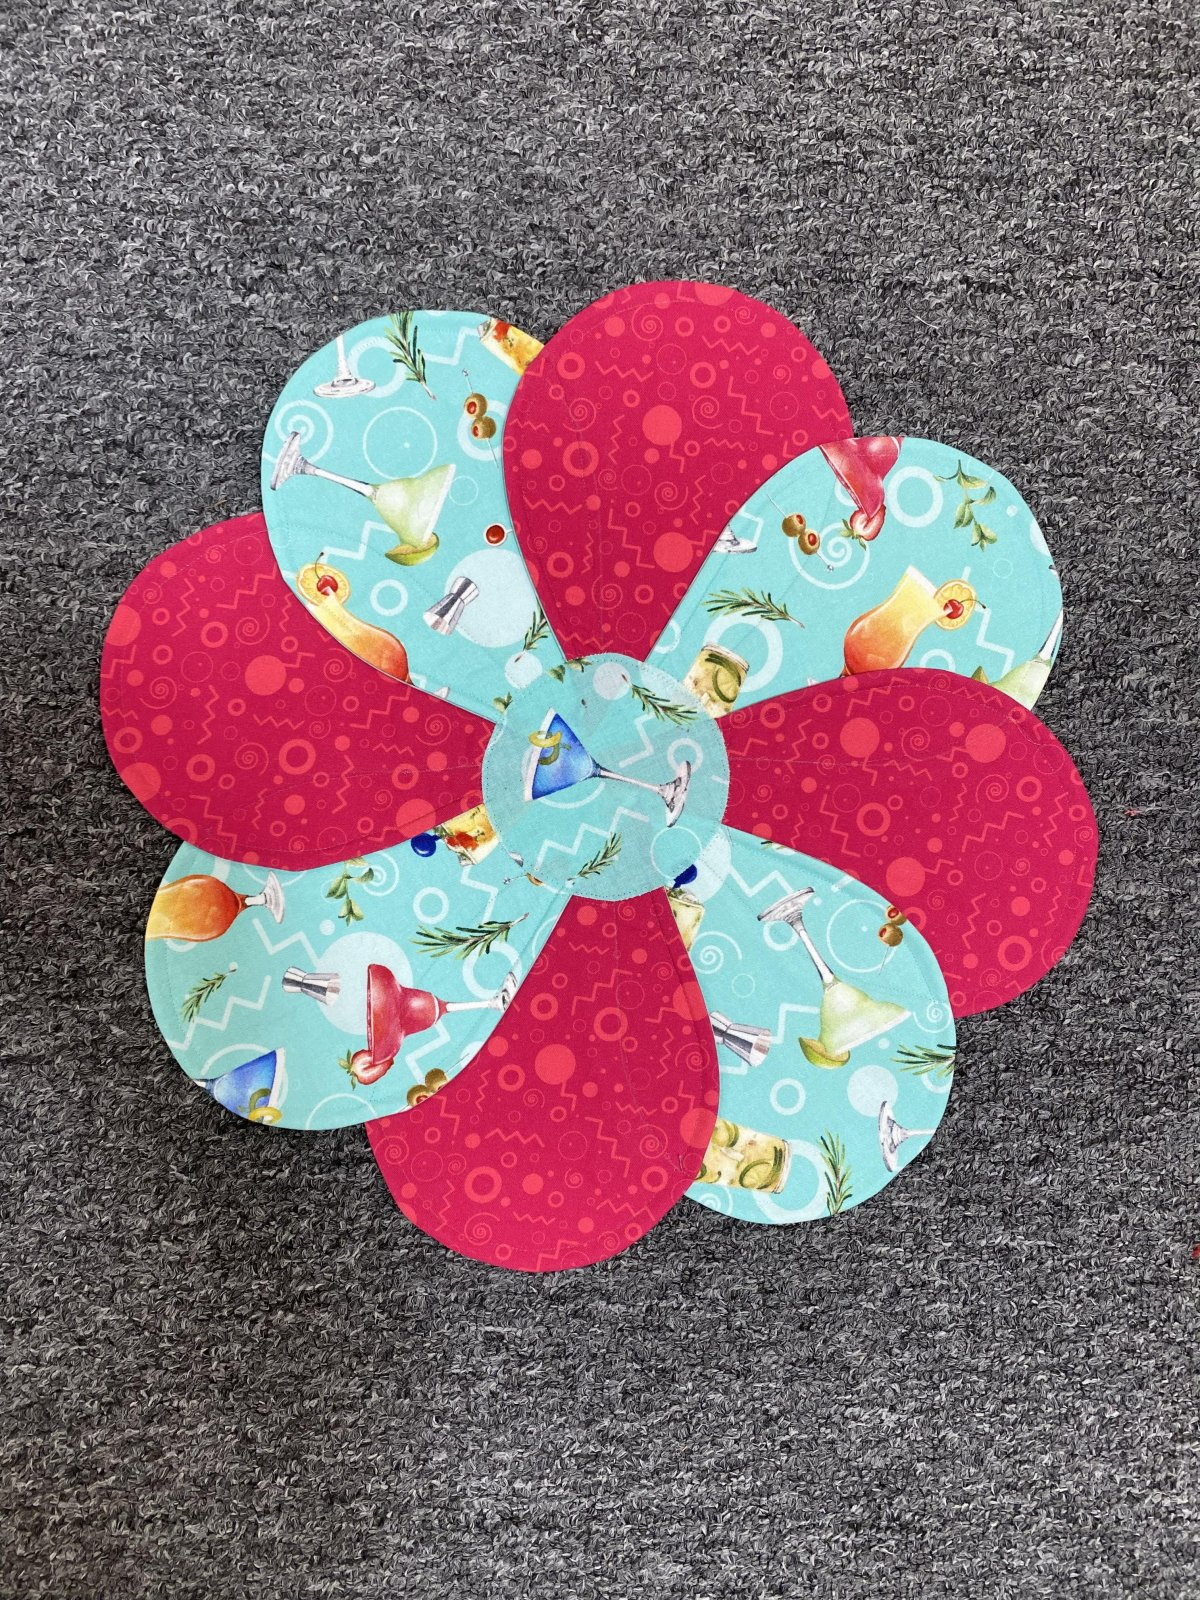 Flower Petals Kit - Cocktails